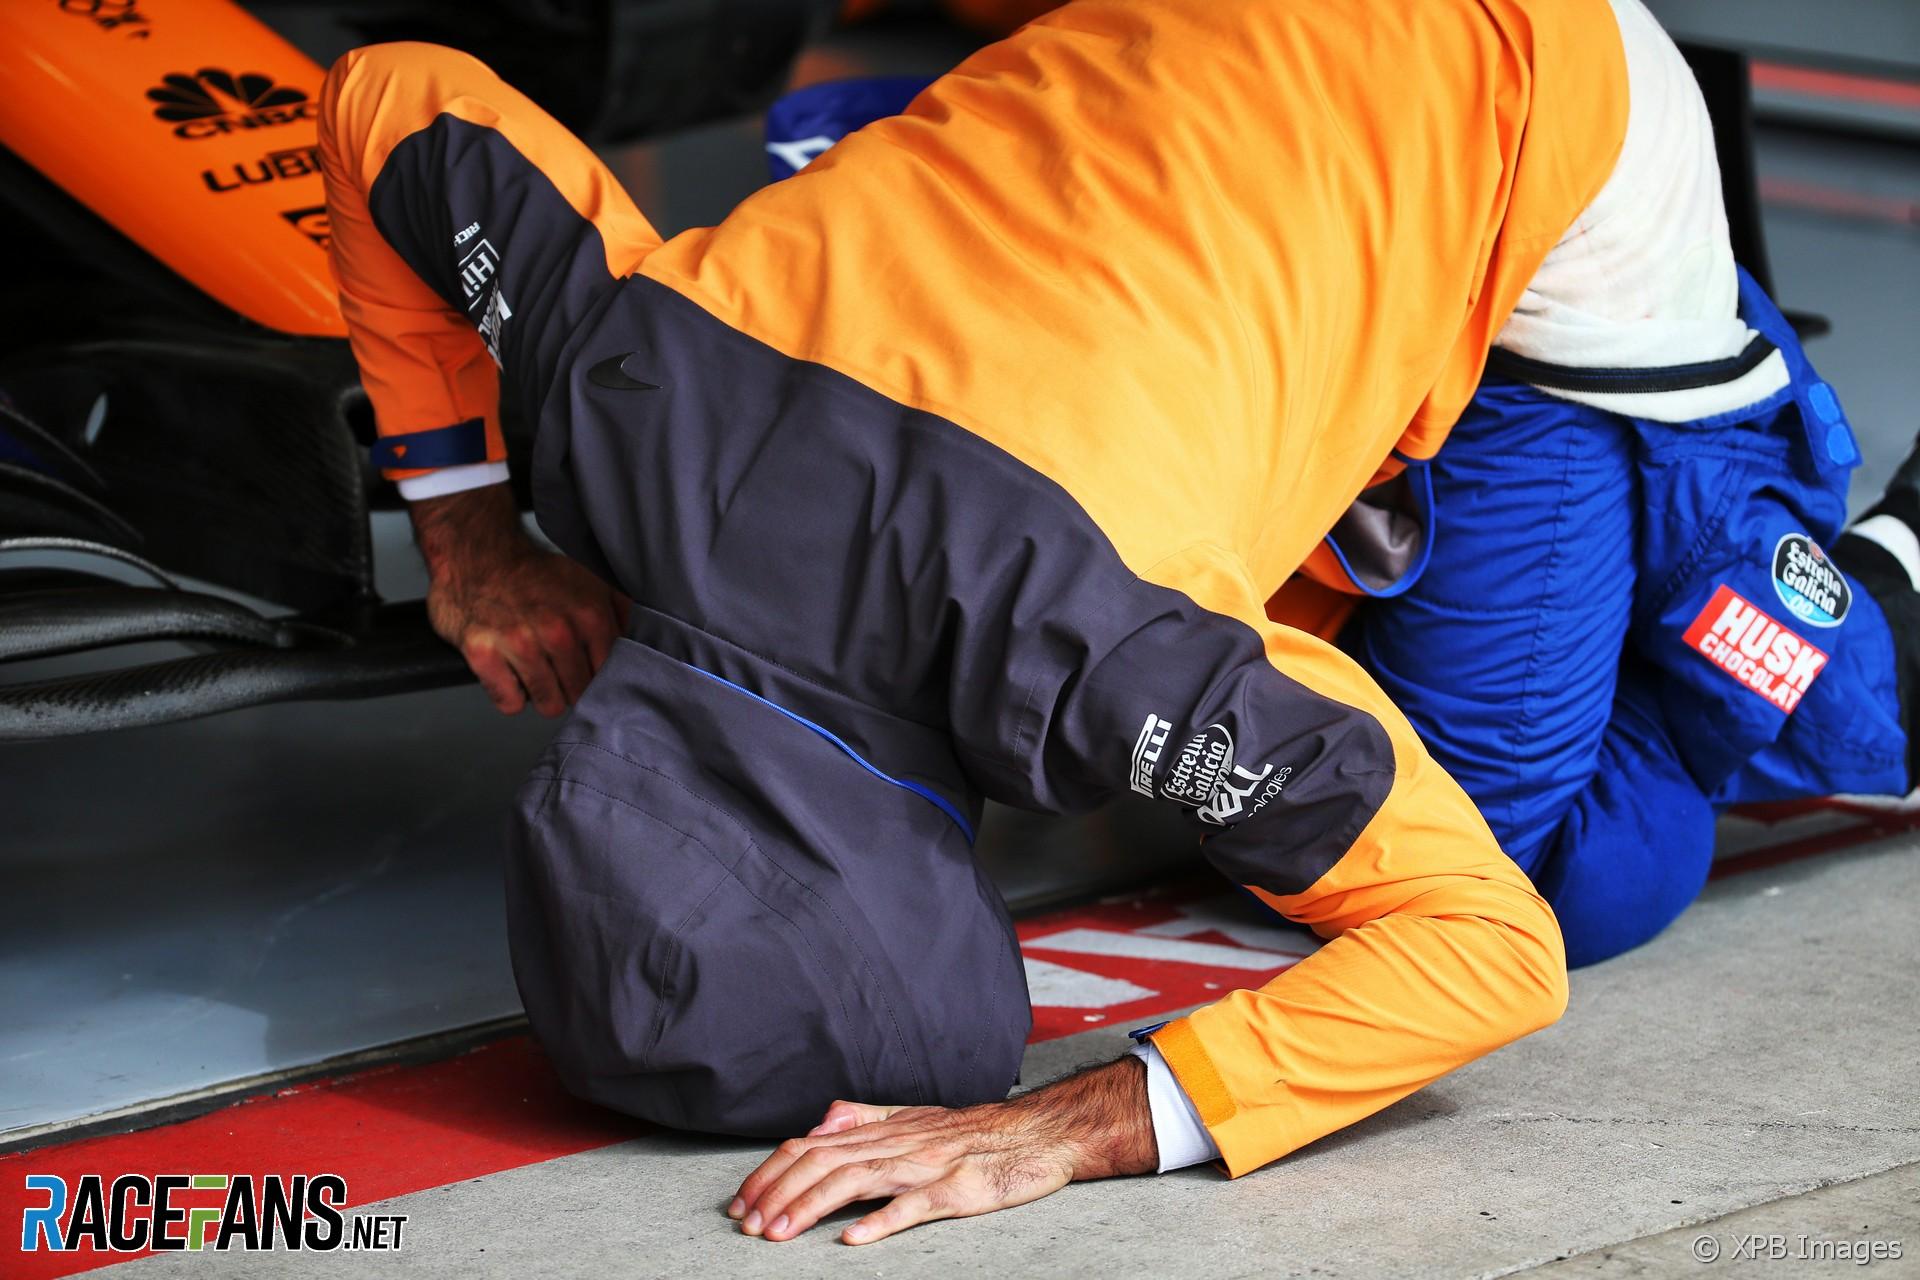 Carlos Sainz Jnr, McLaren, Circuit of the Americas, 2019